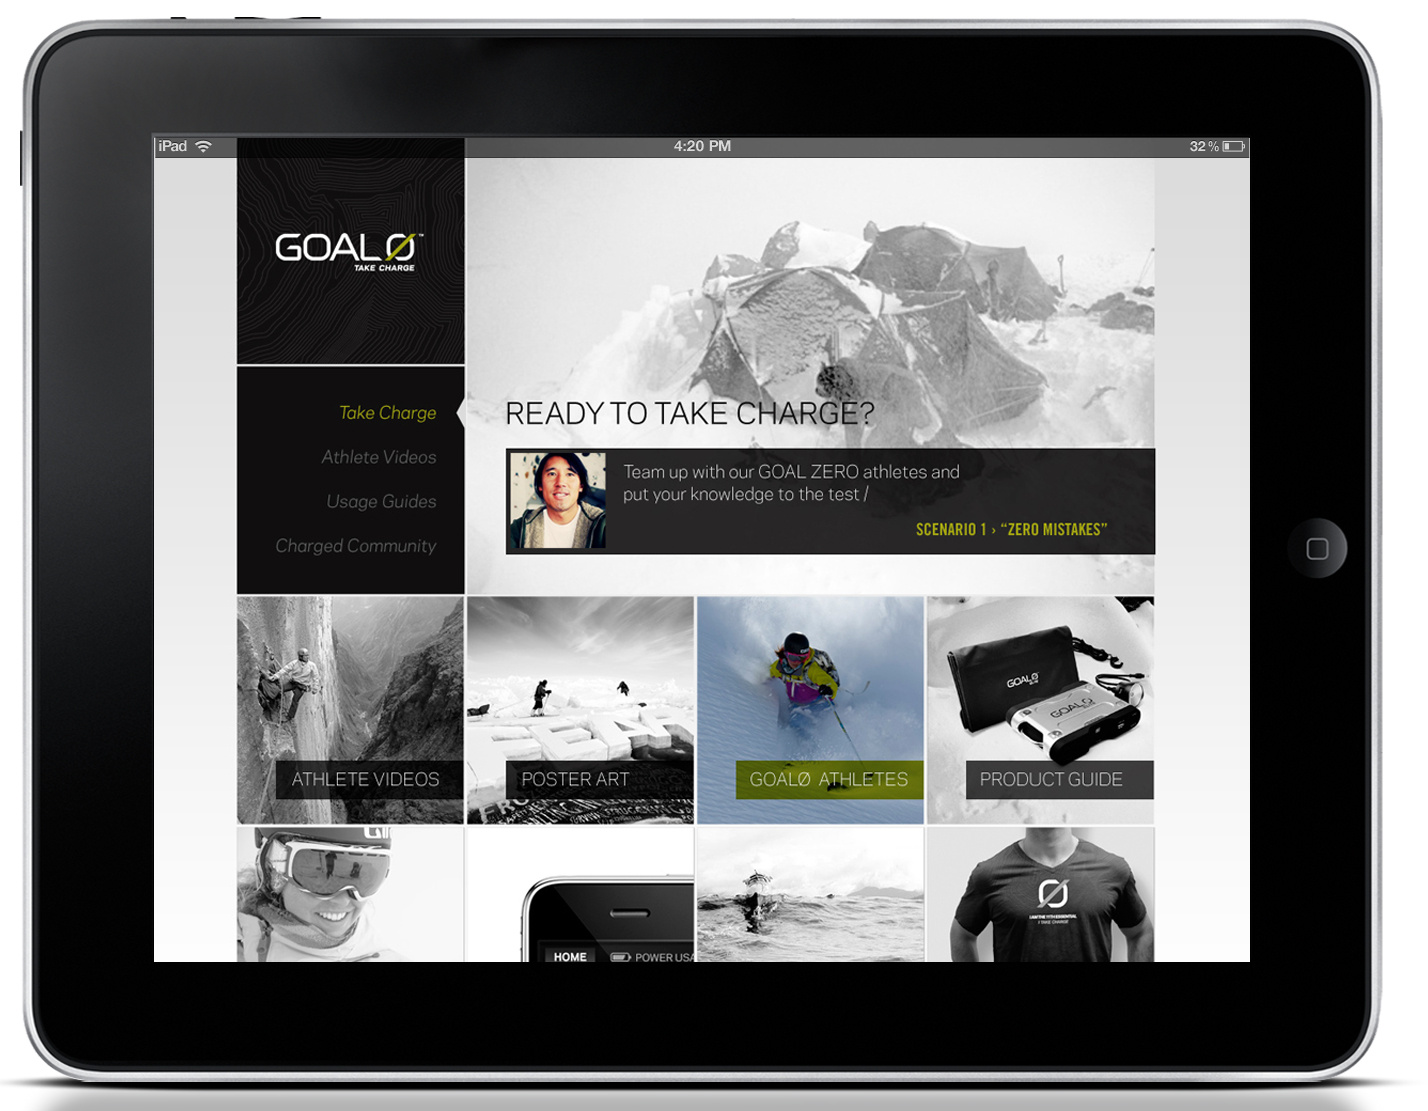 GoalZero-Brand-Advertising-08.jpg